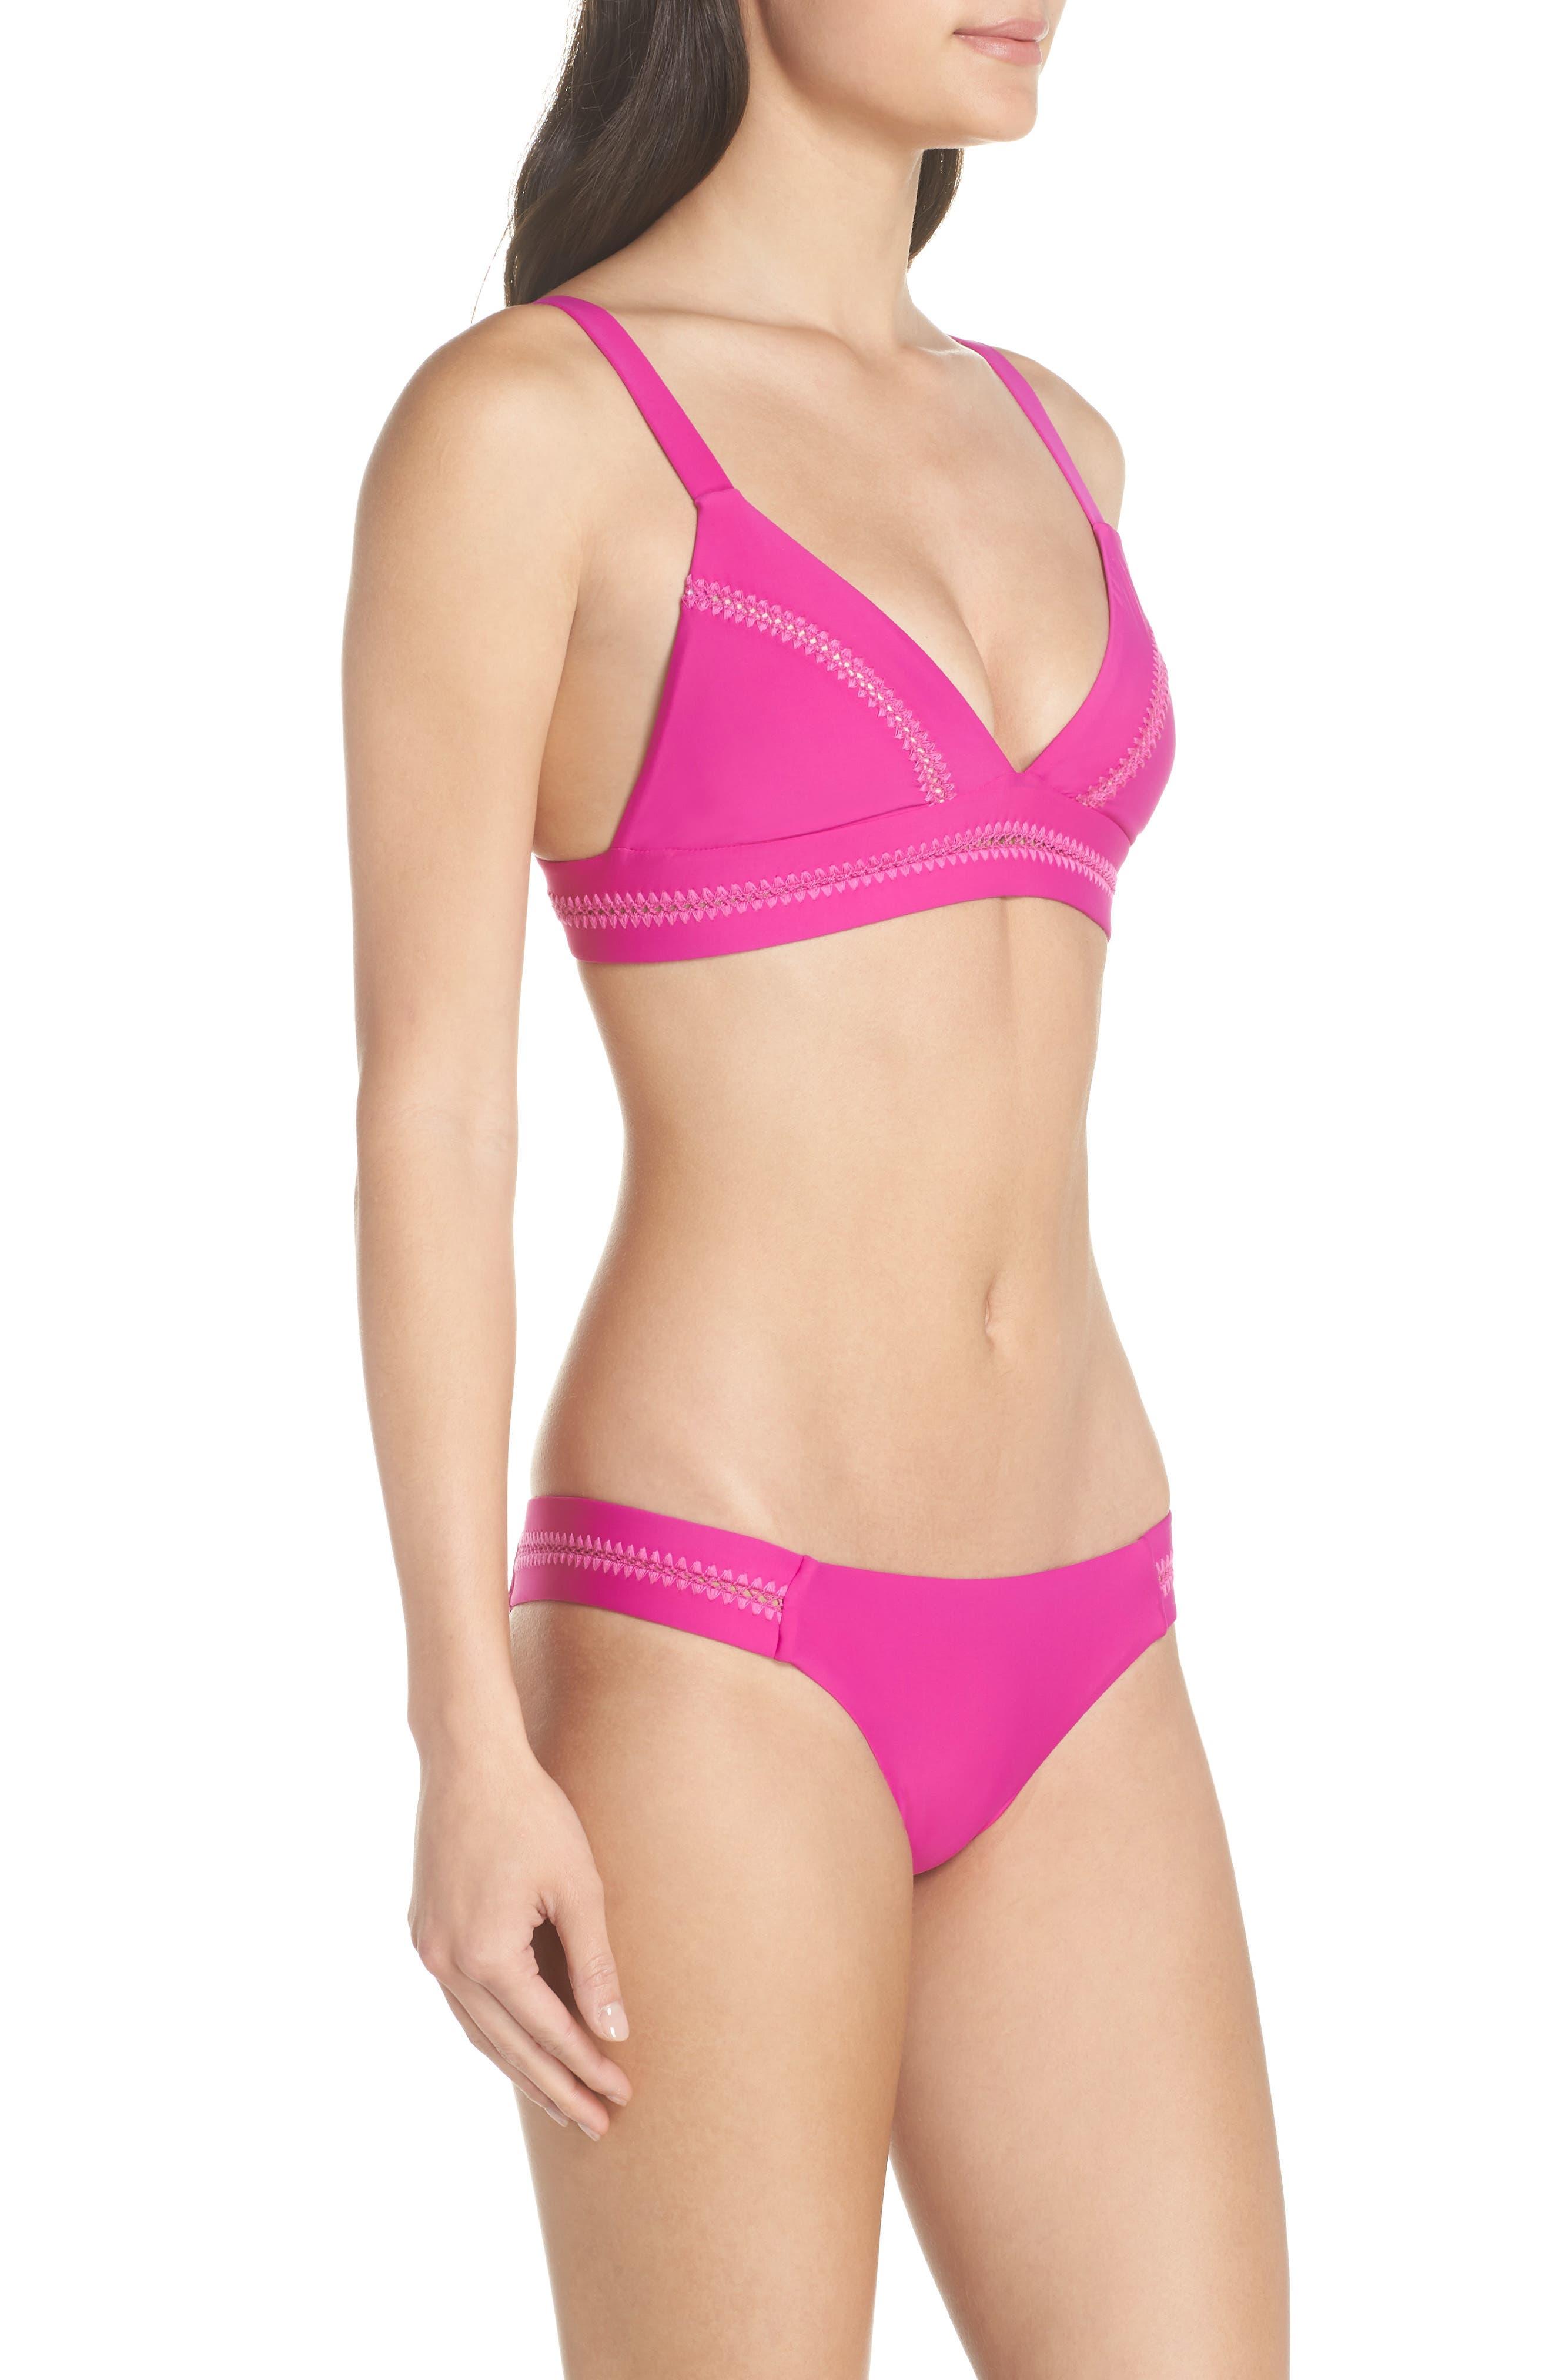 Stitched Elle Halter Bikini Top,                             Alternate thumbnail 5, color,                             Fuchsia